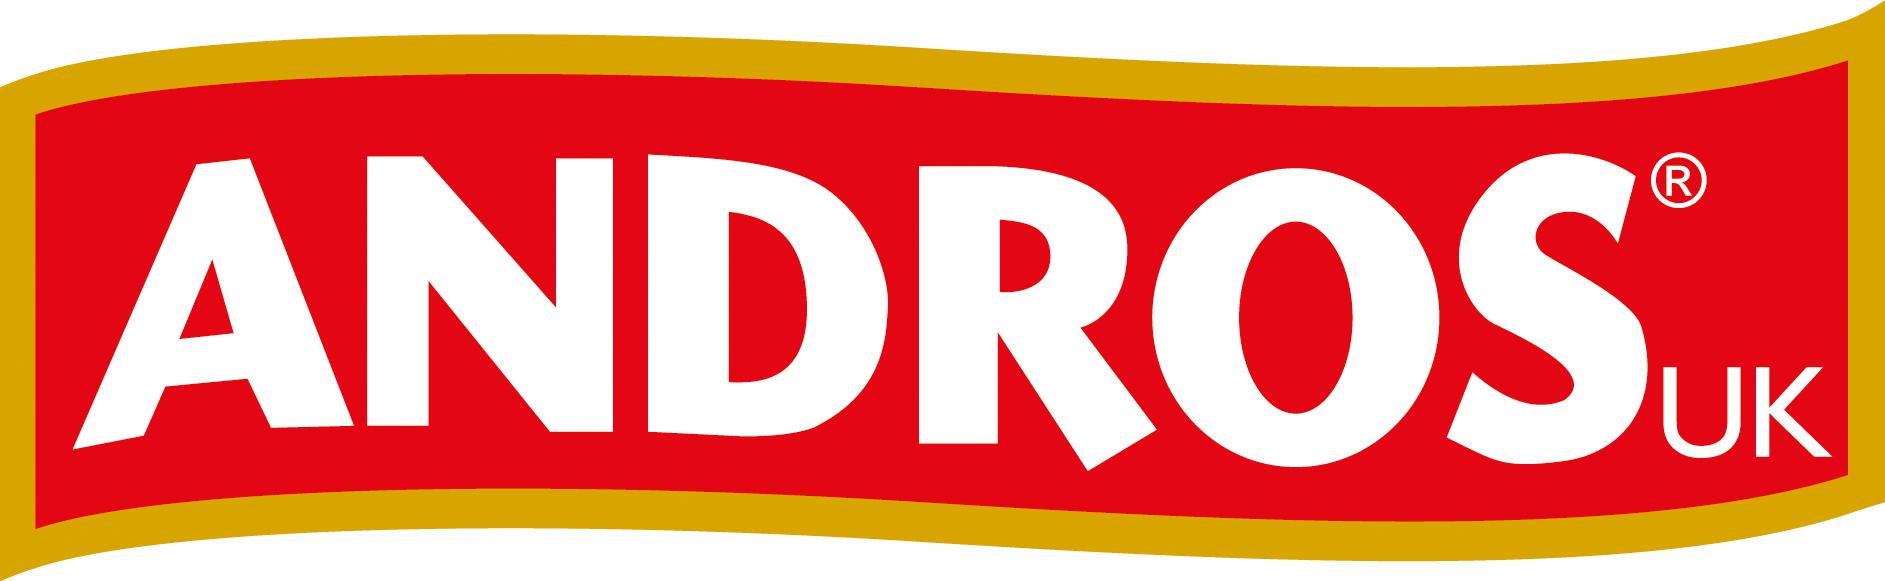 ANDROS final UK logo